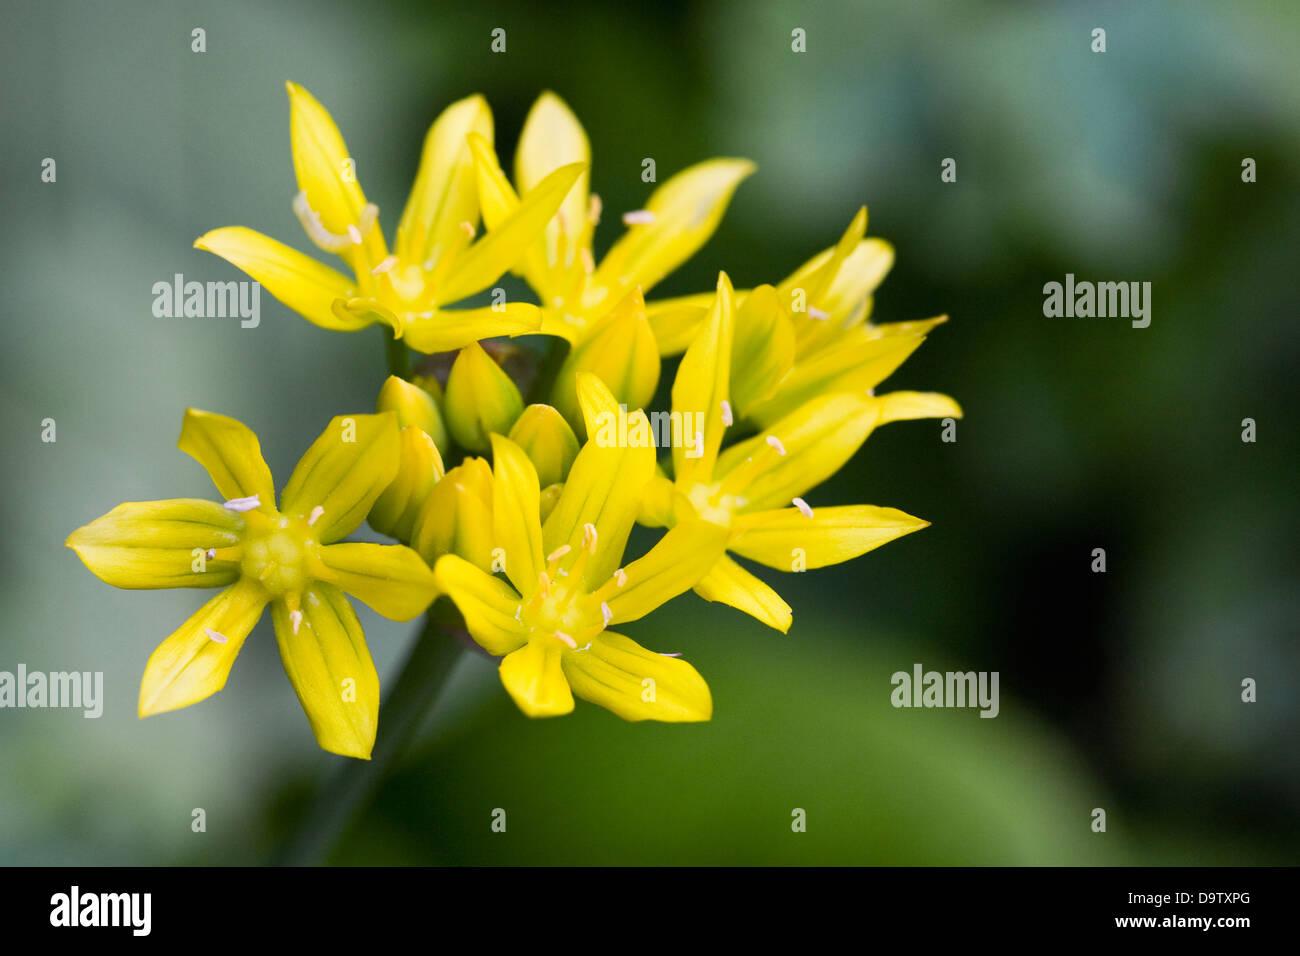 Allium Moly Golden Garlic Flowers Stock Photo 57710872 Alamy